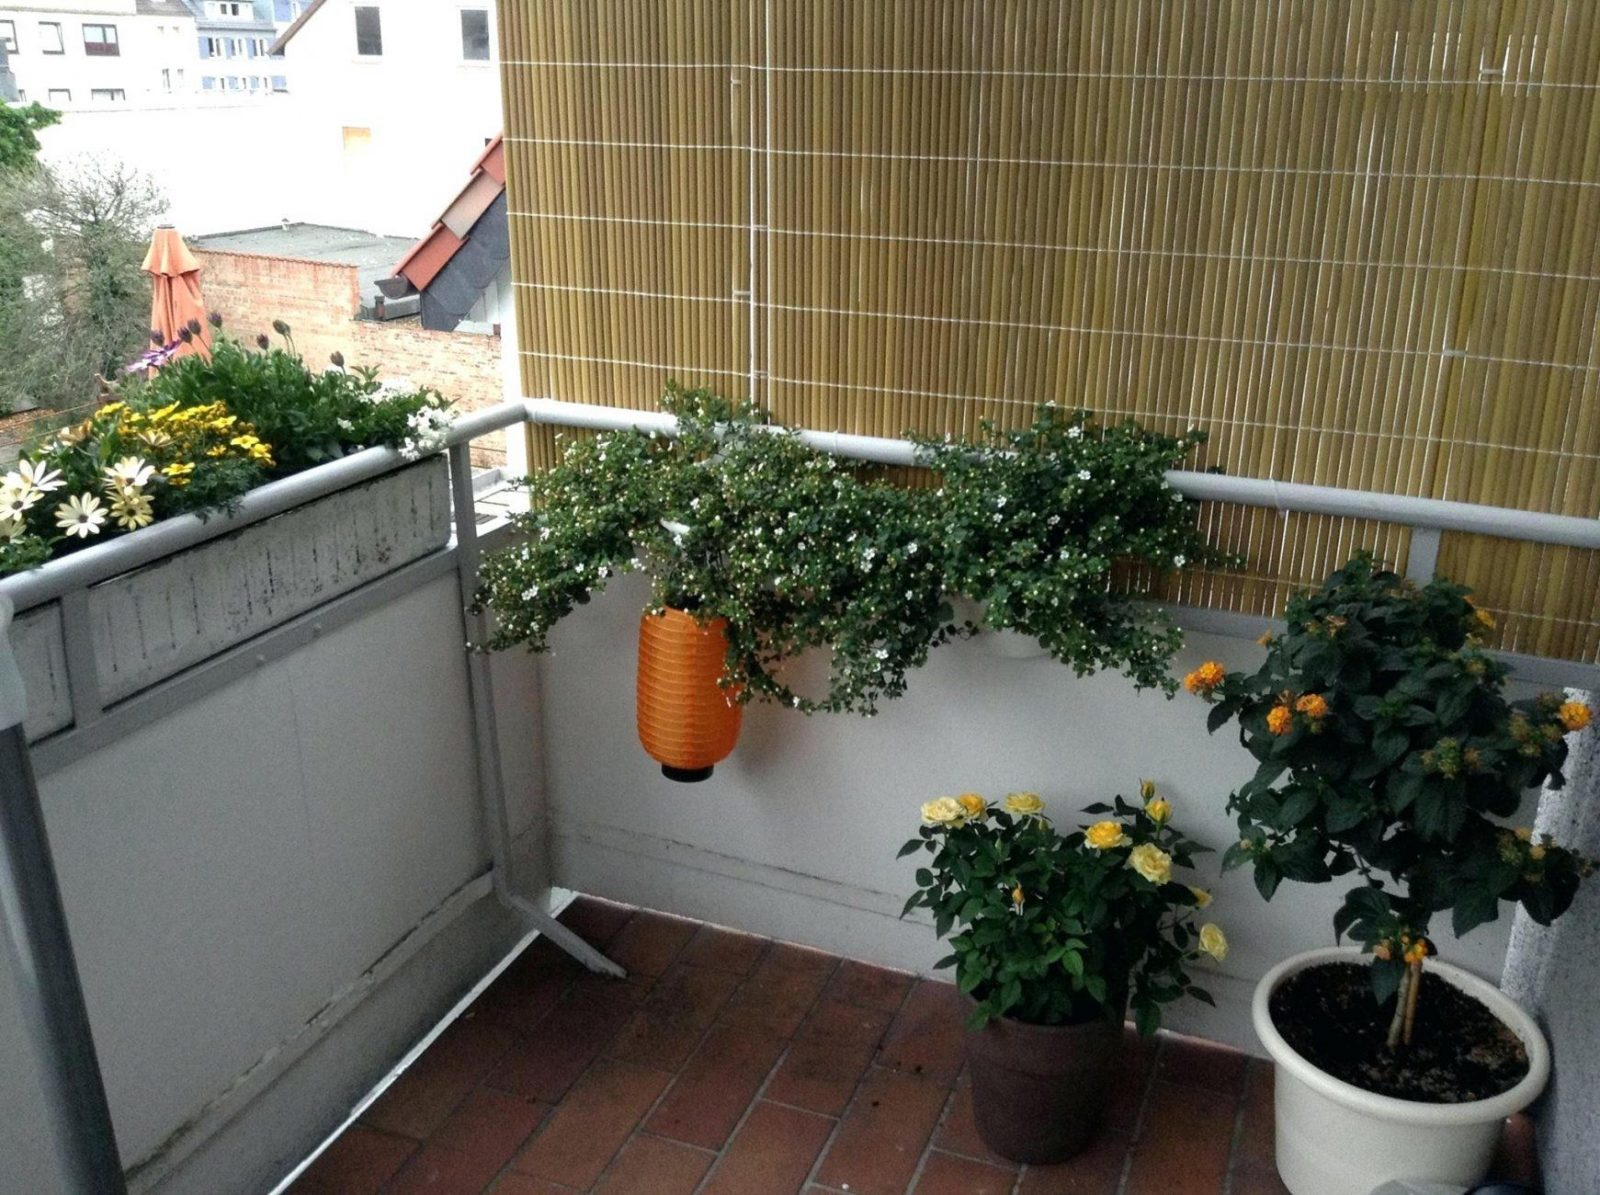 Efeu Balkon Hecke Am Laufenden Meter Fa R Den Cm Hoch Breit Hedera von Hecke Am Laufenden Meter Selber Machen Bild